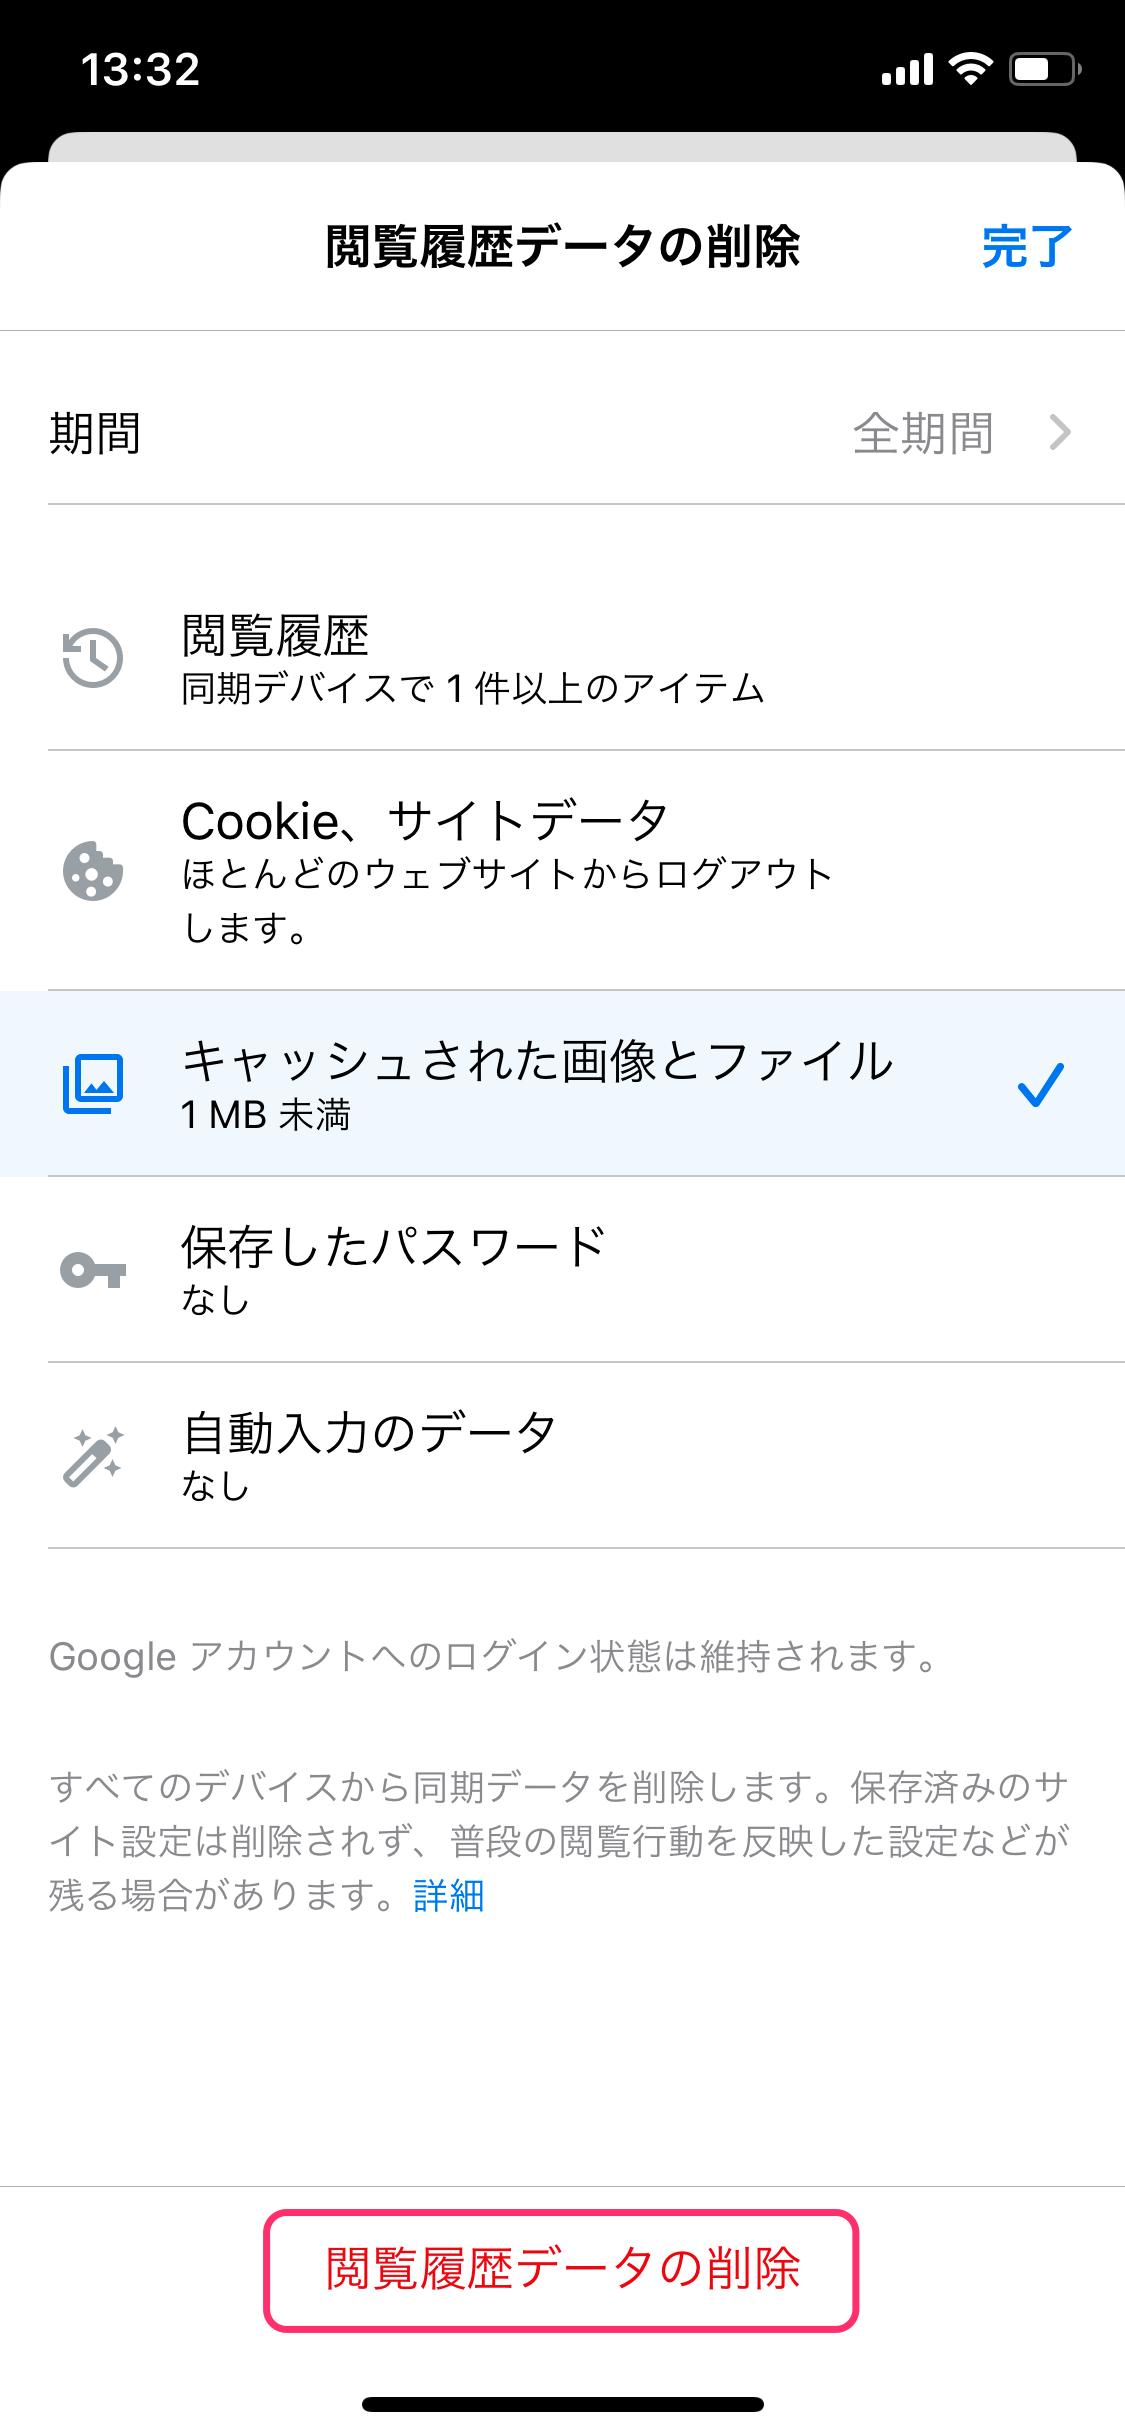 Chrome 閲覧履歴データ削除